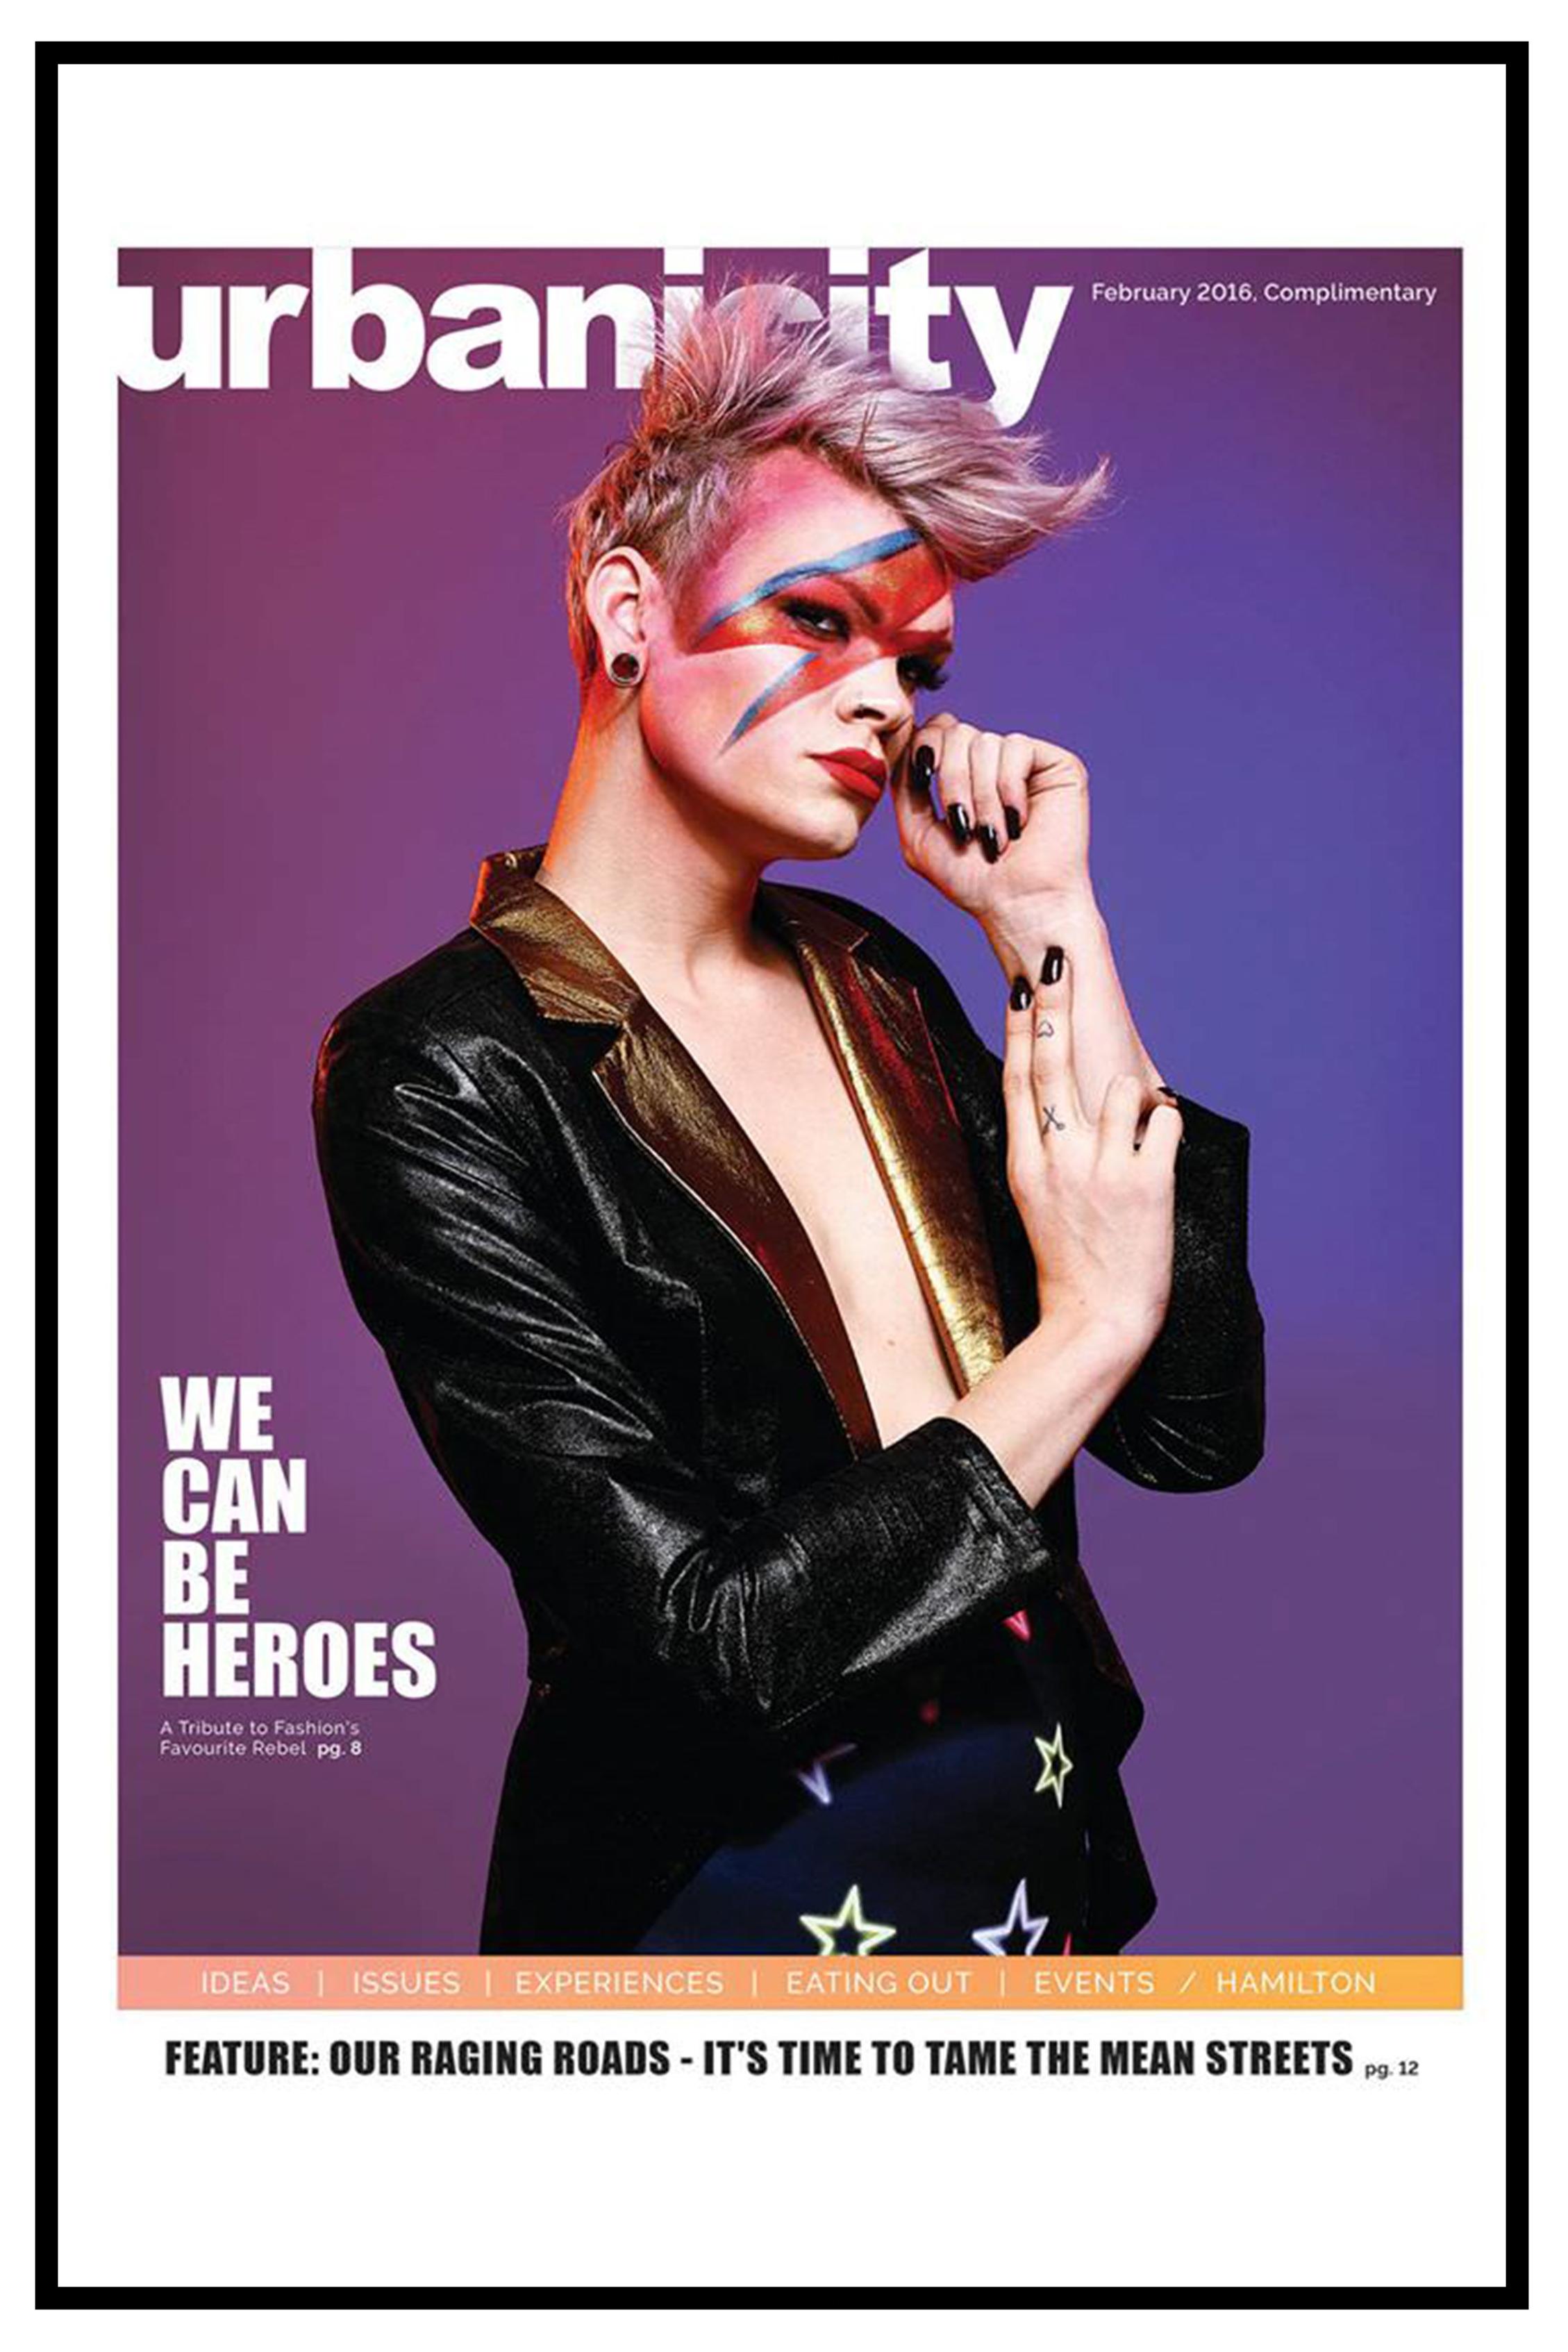 Marta-Hewson-Urbanicity-David-Bowie-Heroes.jpg